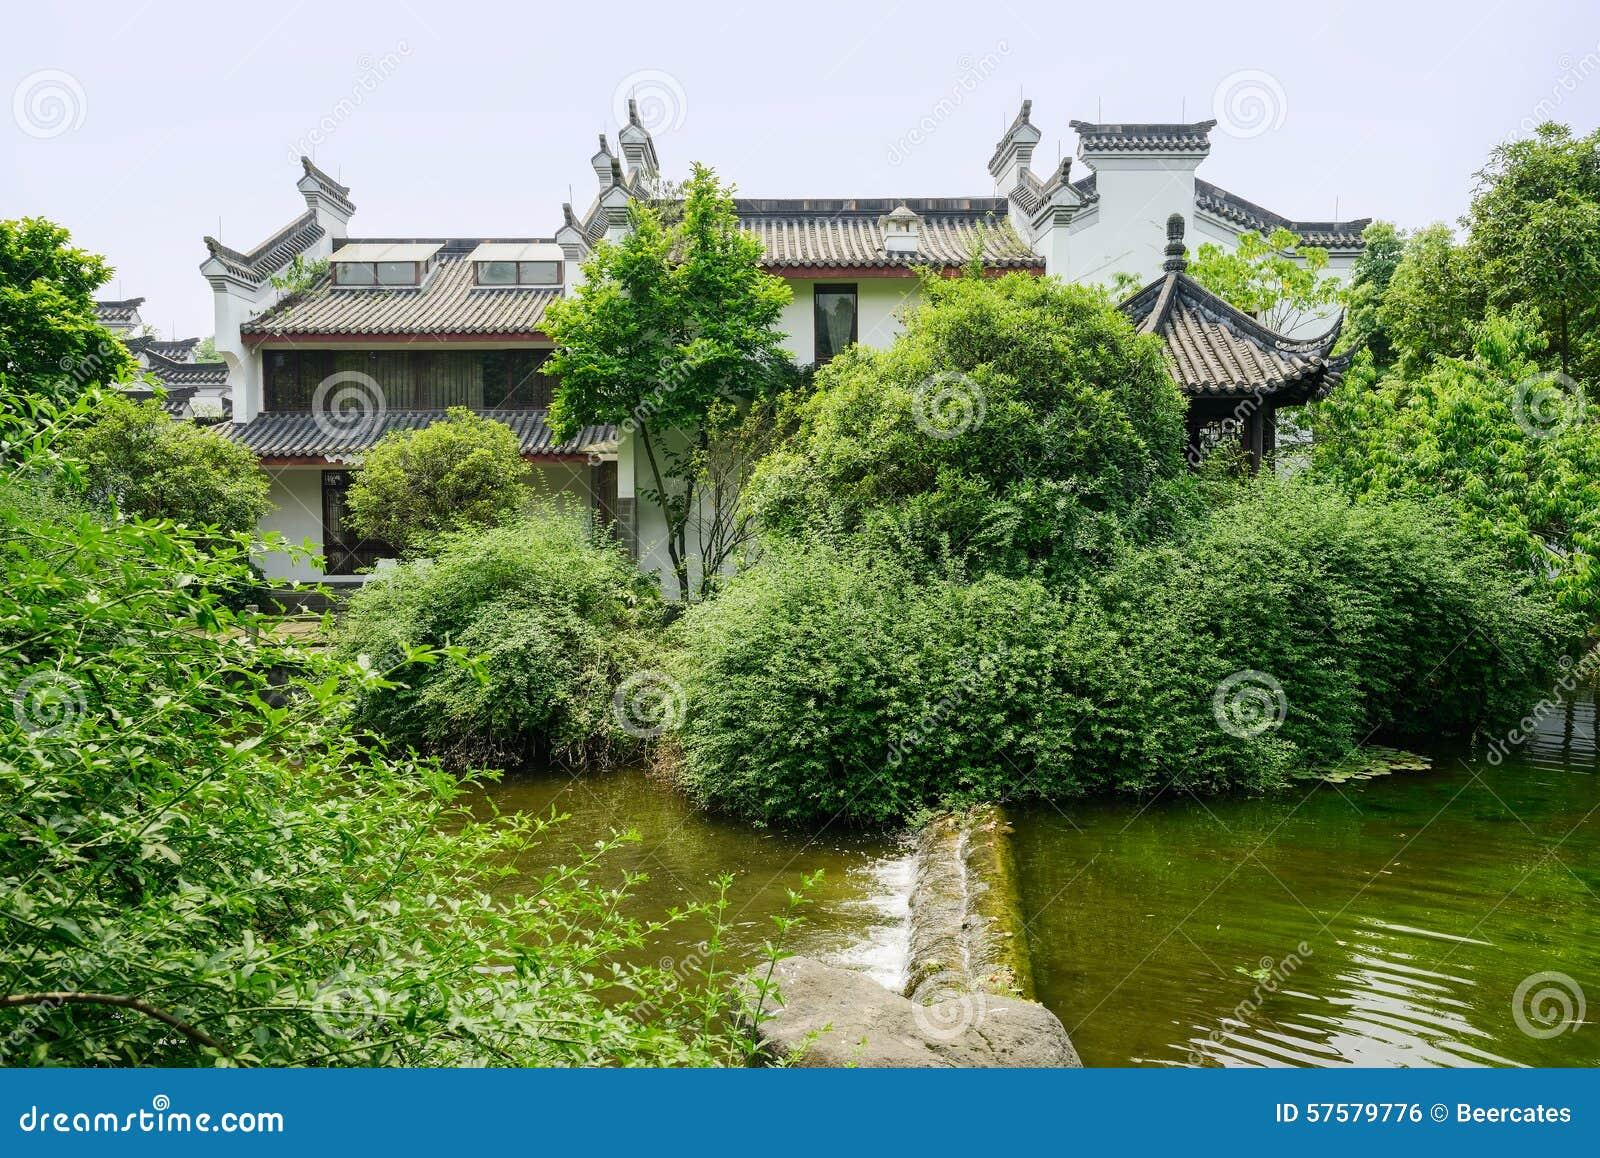 Case Tradizionali Cinesi : Case tradizionali cinesi di waterside in legno su estate soleggiata